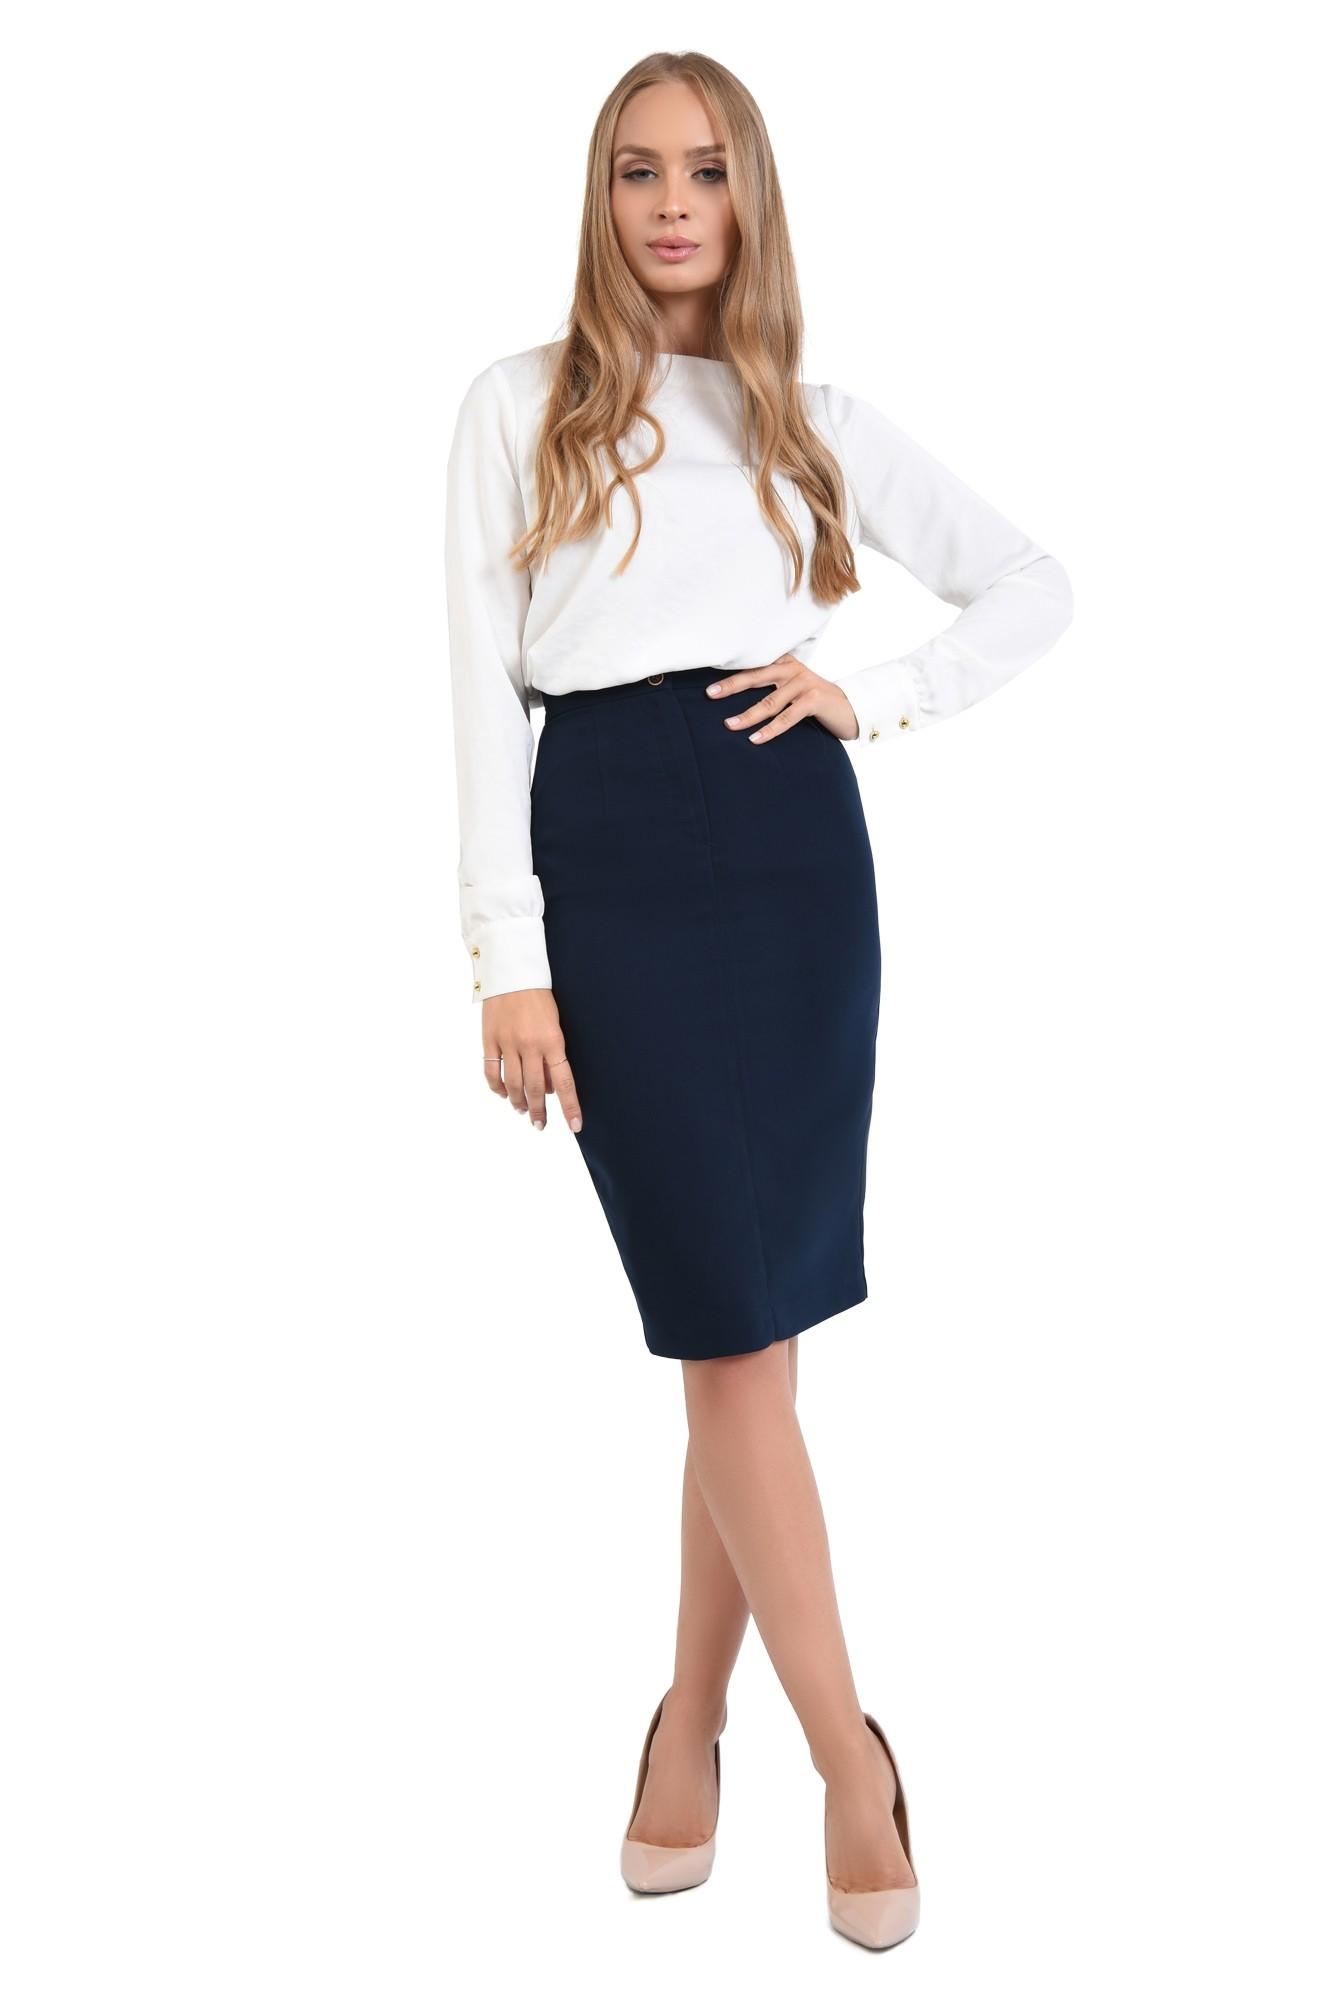 360 - bluza casual, dreapta, lejera, nasturi decorativi metalici, bluze dama